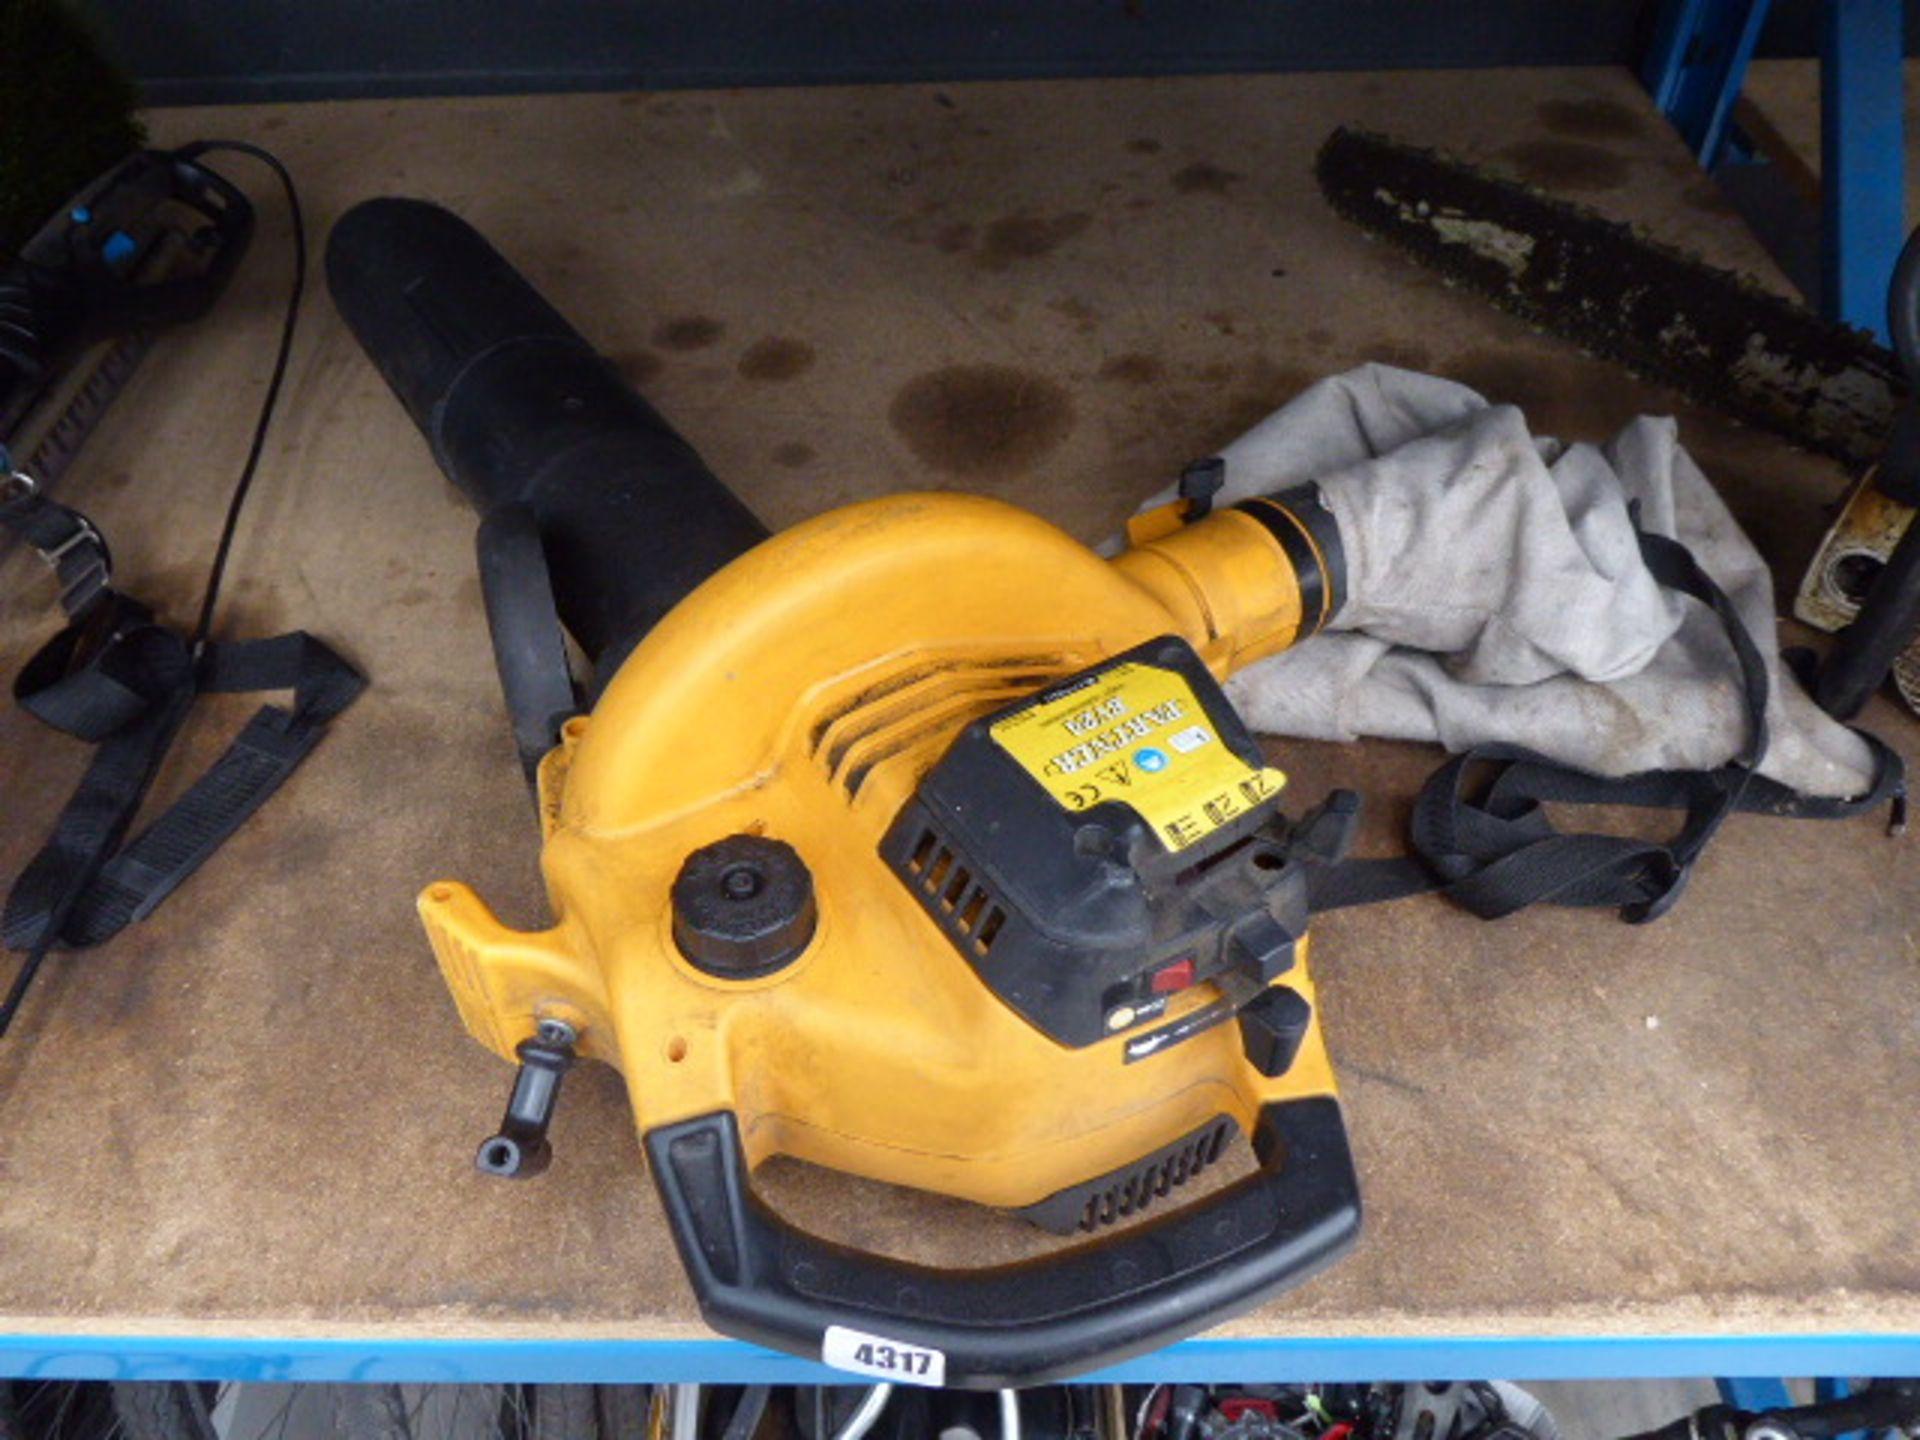 Lot 4317 - 4075 Partner petrol powered leaf blower with bag